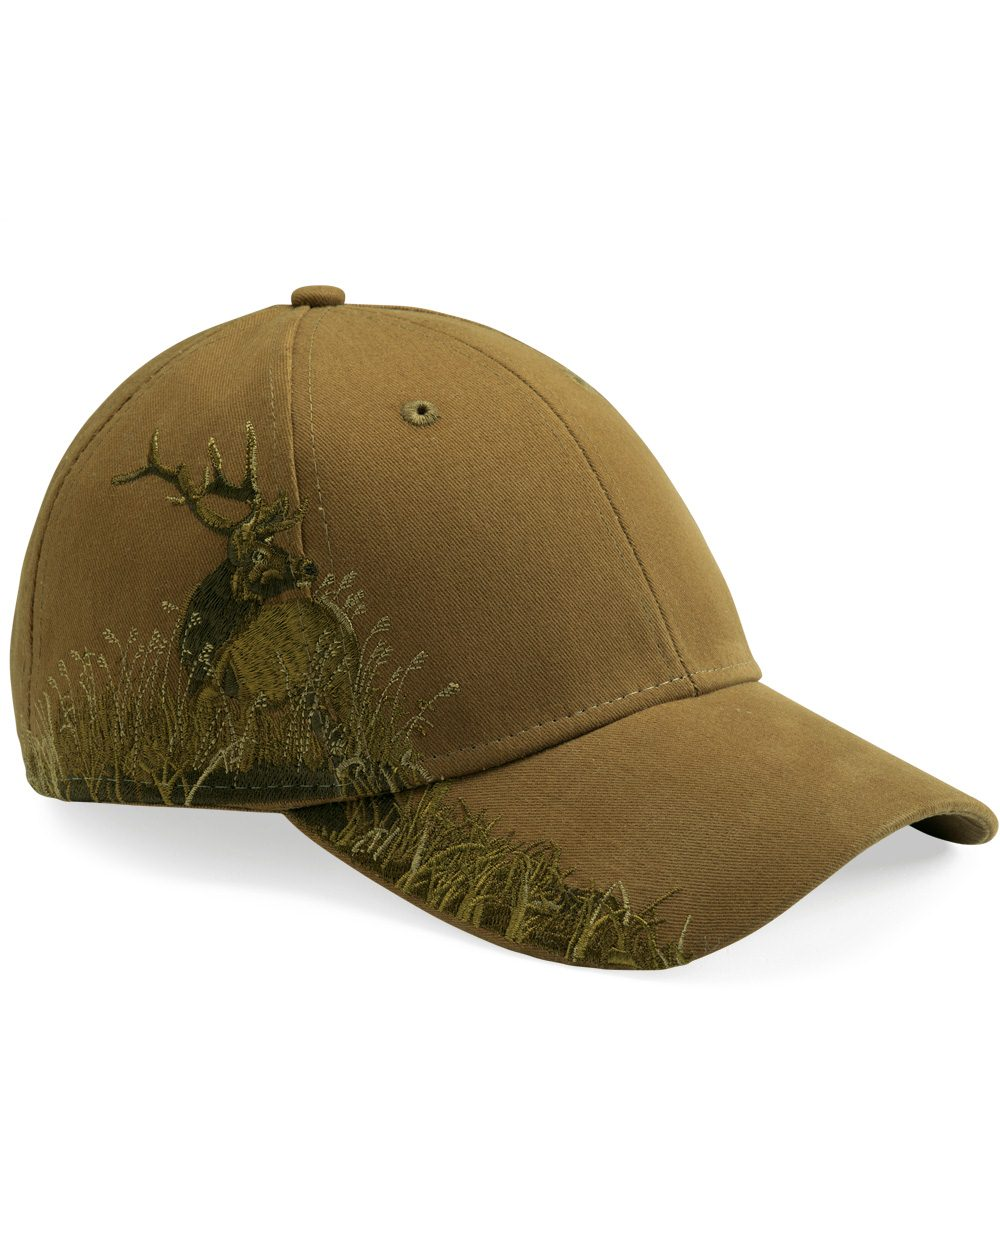 DRI DUCK 3259 - Elk Cap